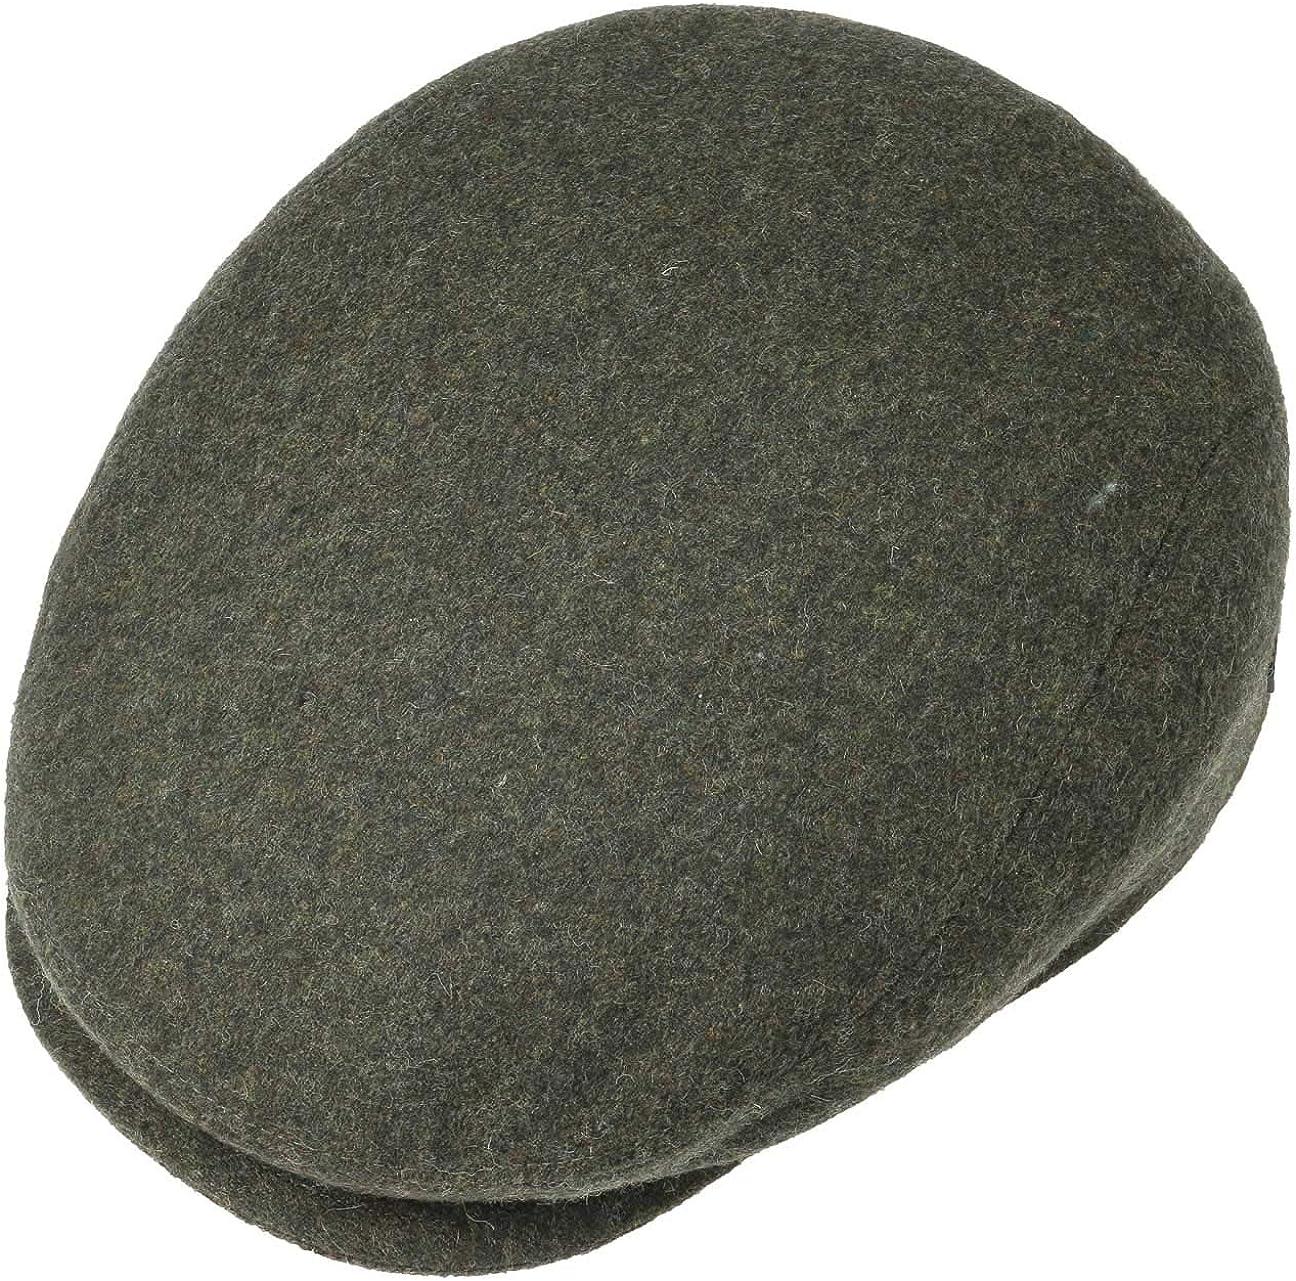 XXL 62 cm Sporty Peaked Cap Lipodo Sport Flat Cap Olive-Green for Men and Women Autumn Winter Flat Cap with Peak in Sizes XS 53 cm